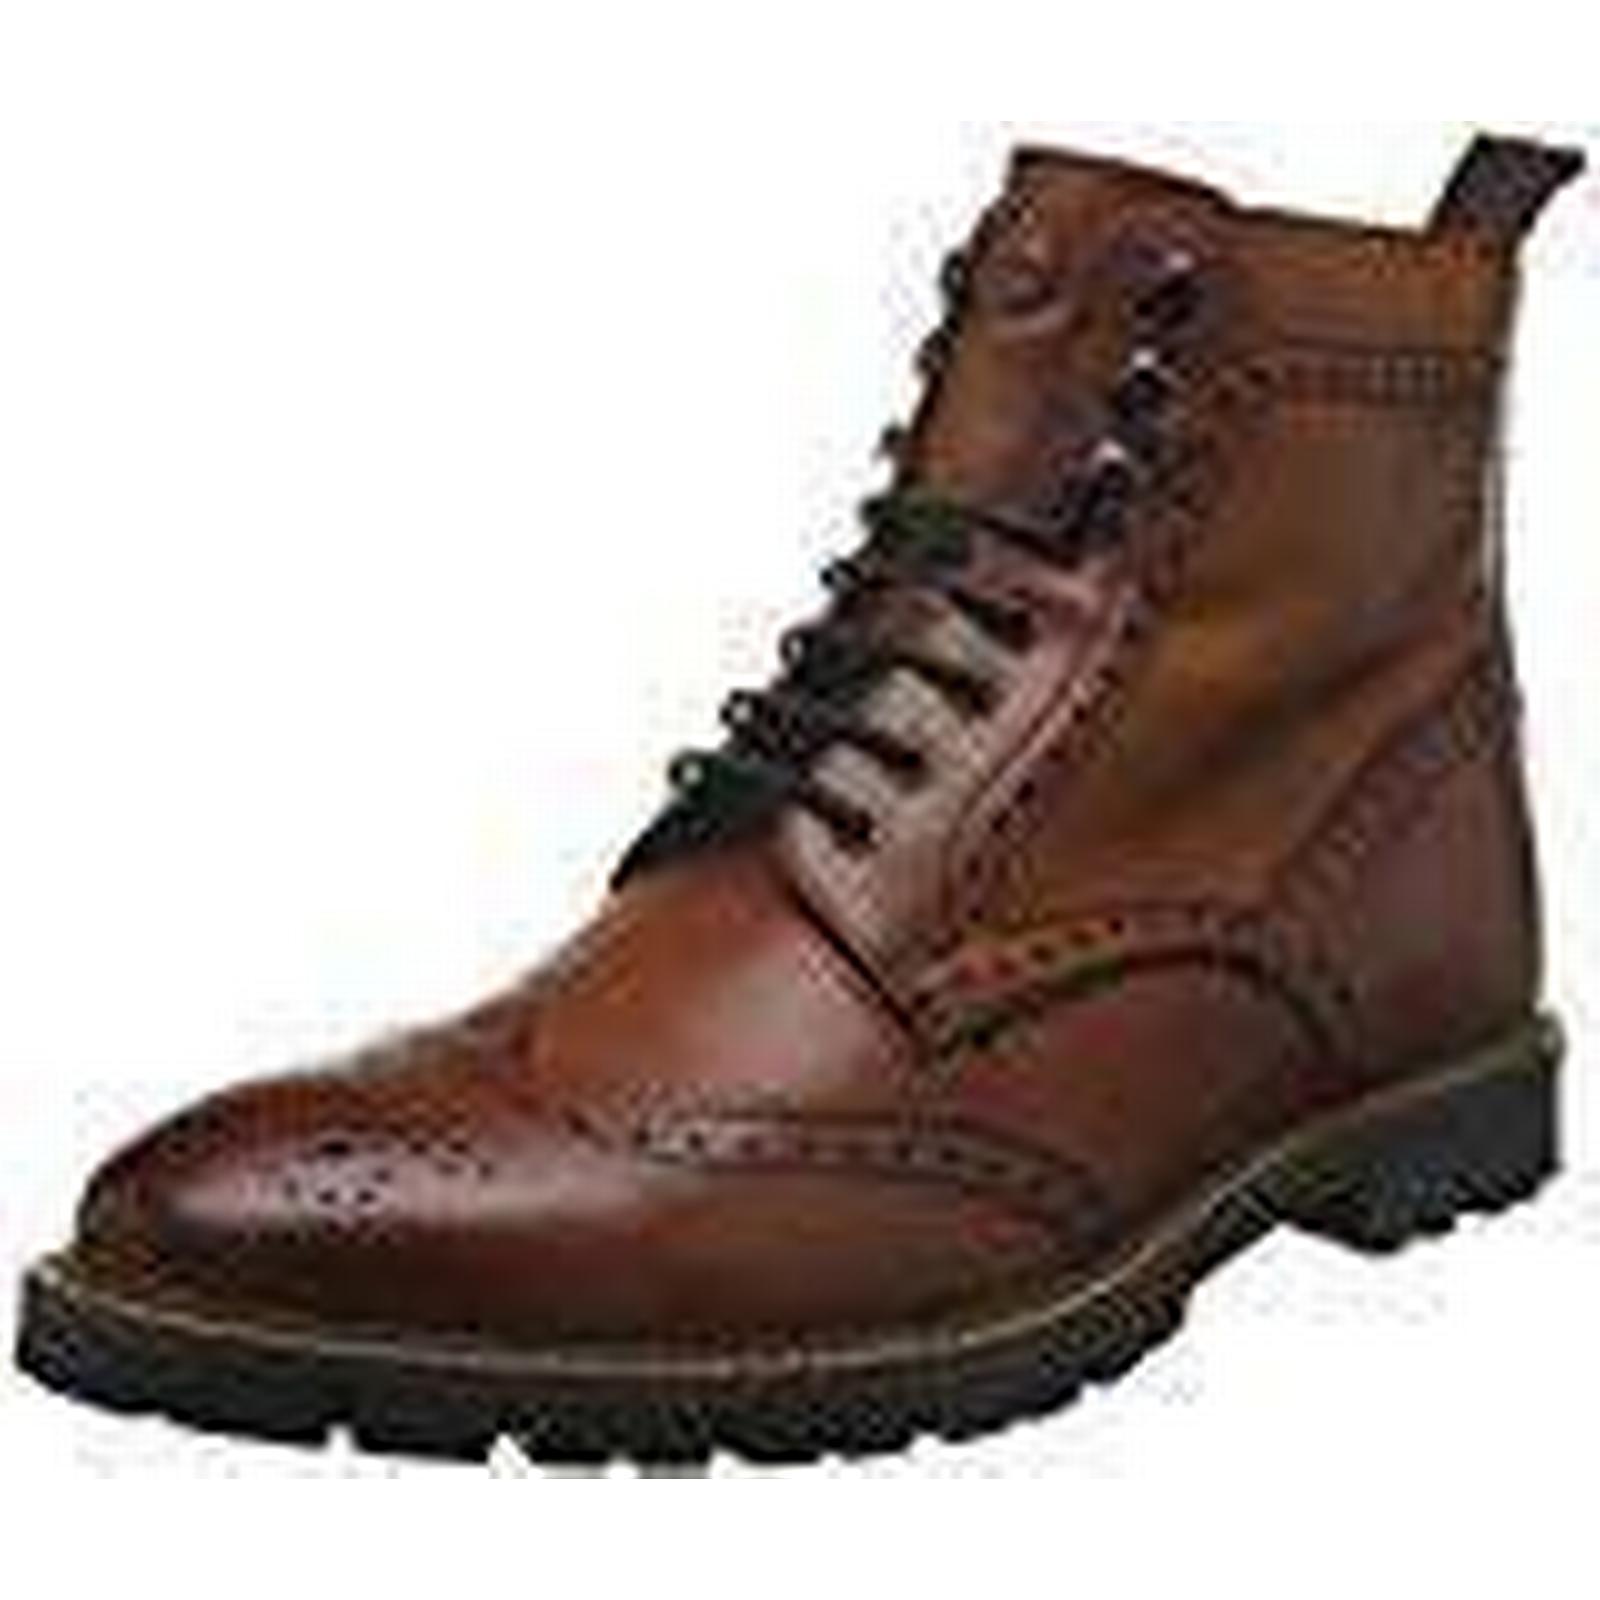 Base Beige London Mens RP05 Boots Beige Base Size: 6 UK 47cb06